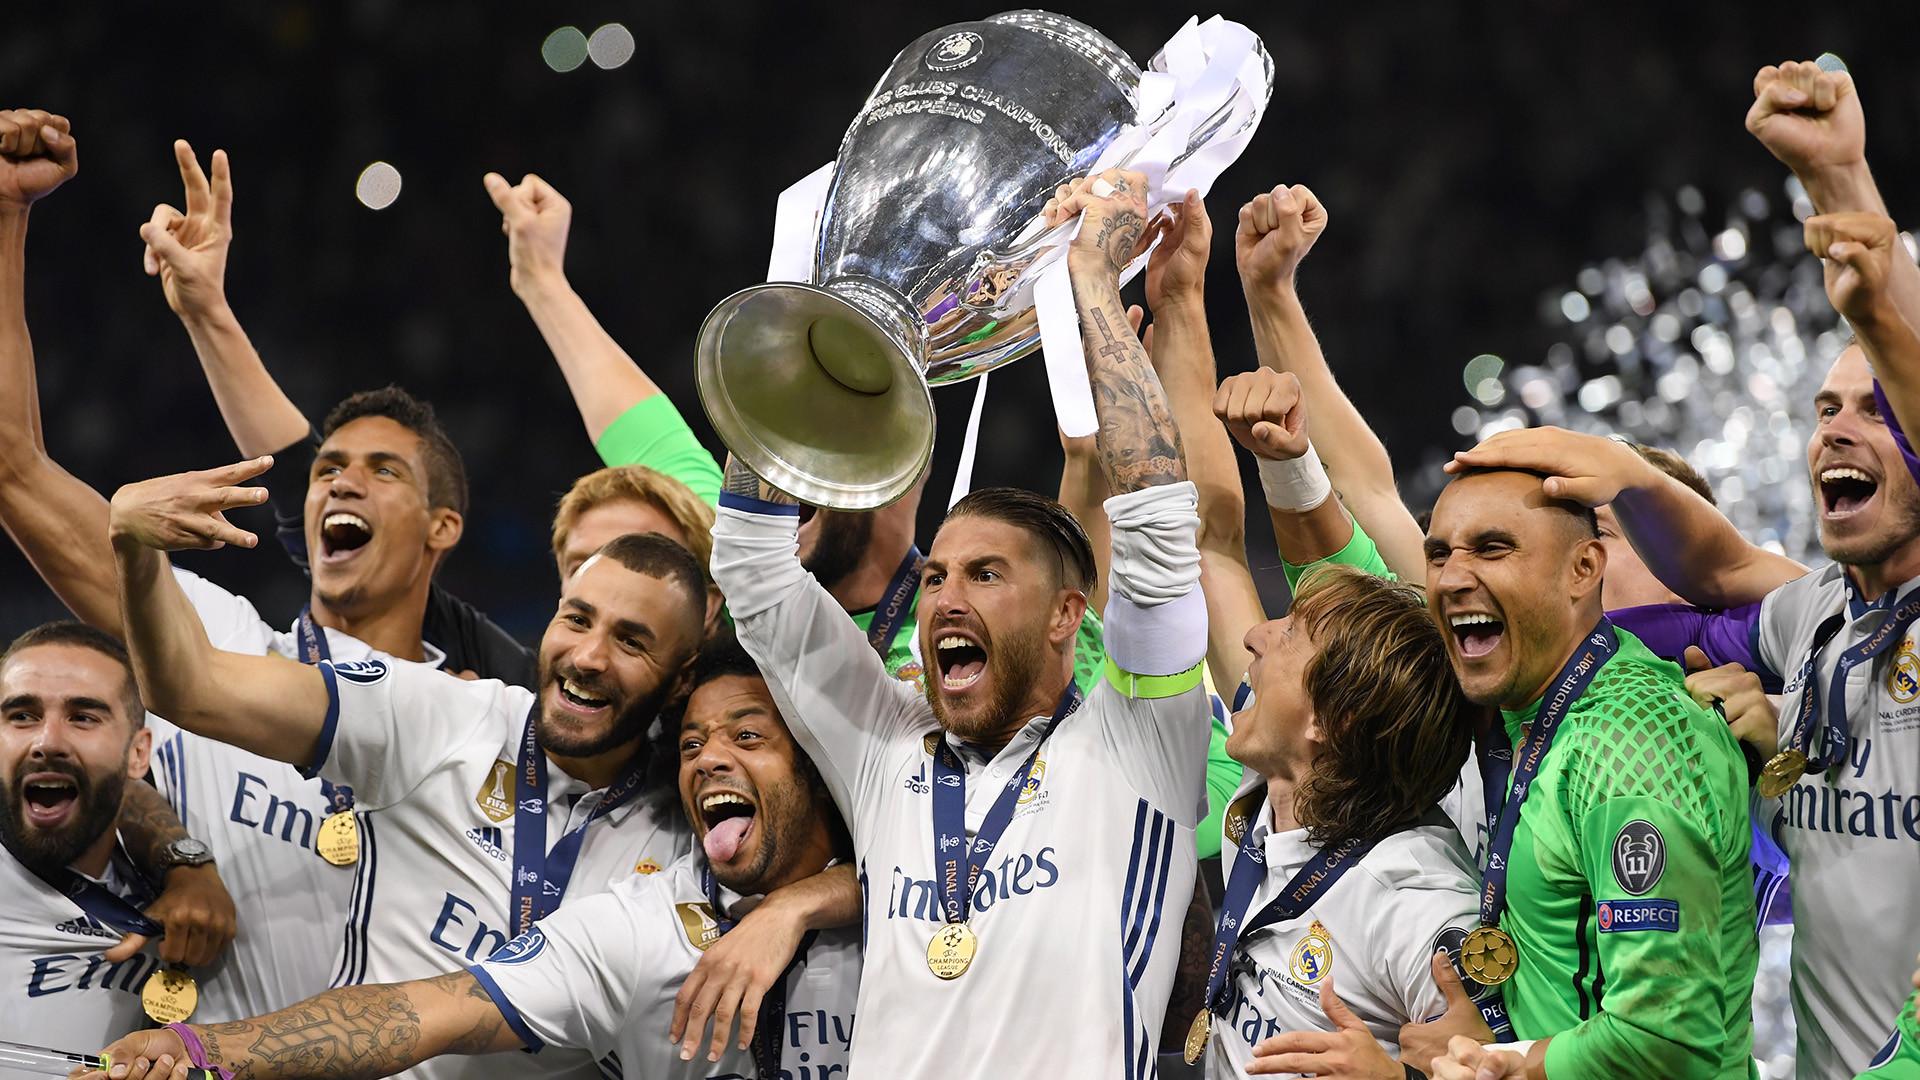 Real madrid celebrating wallpapers hd 2018 wallpapertag - Madrid wallpaper ...